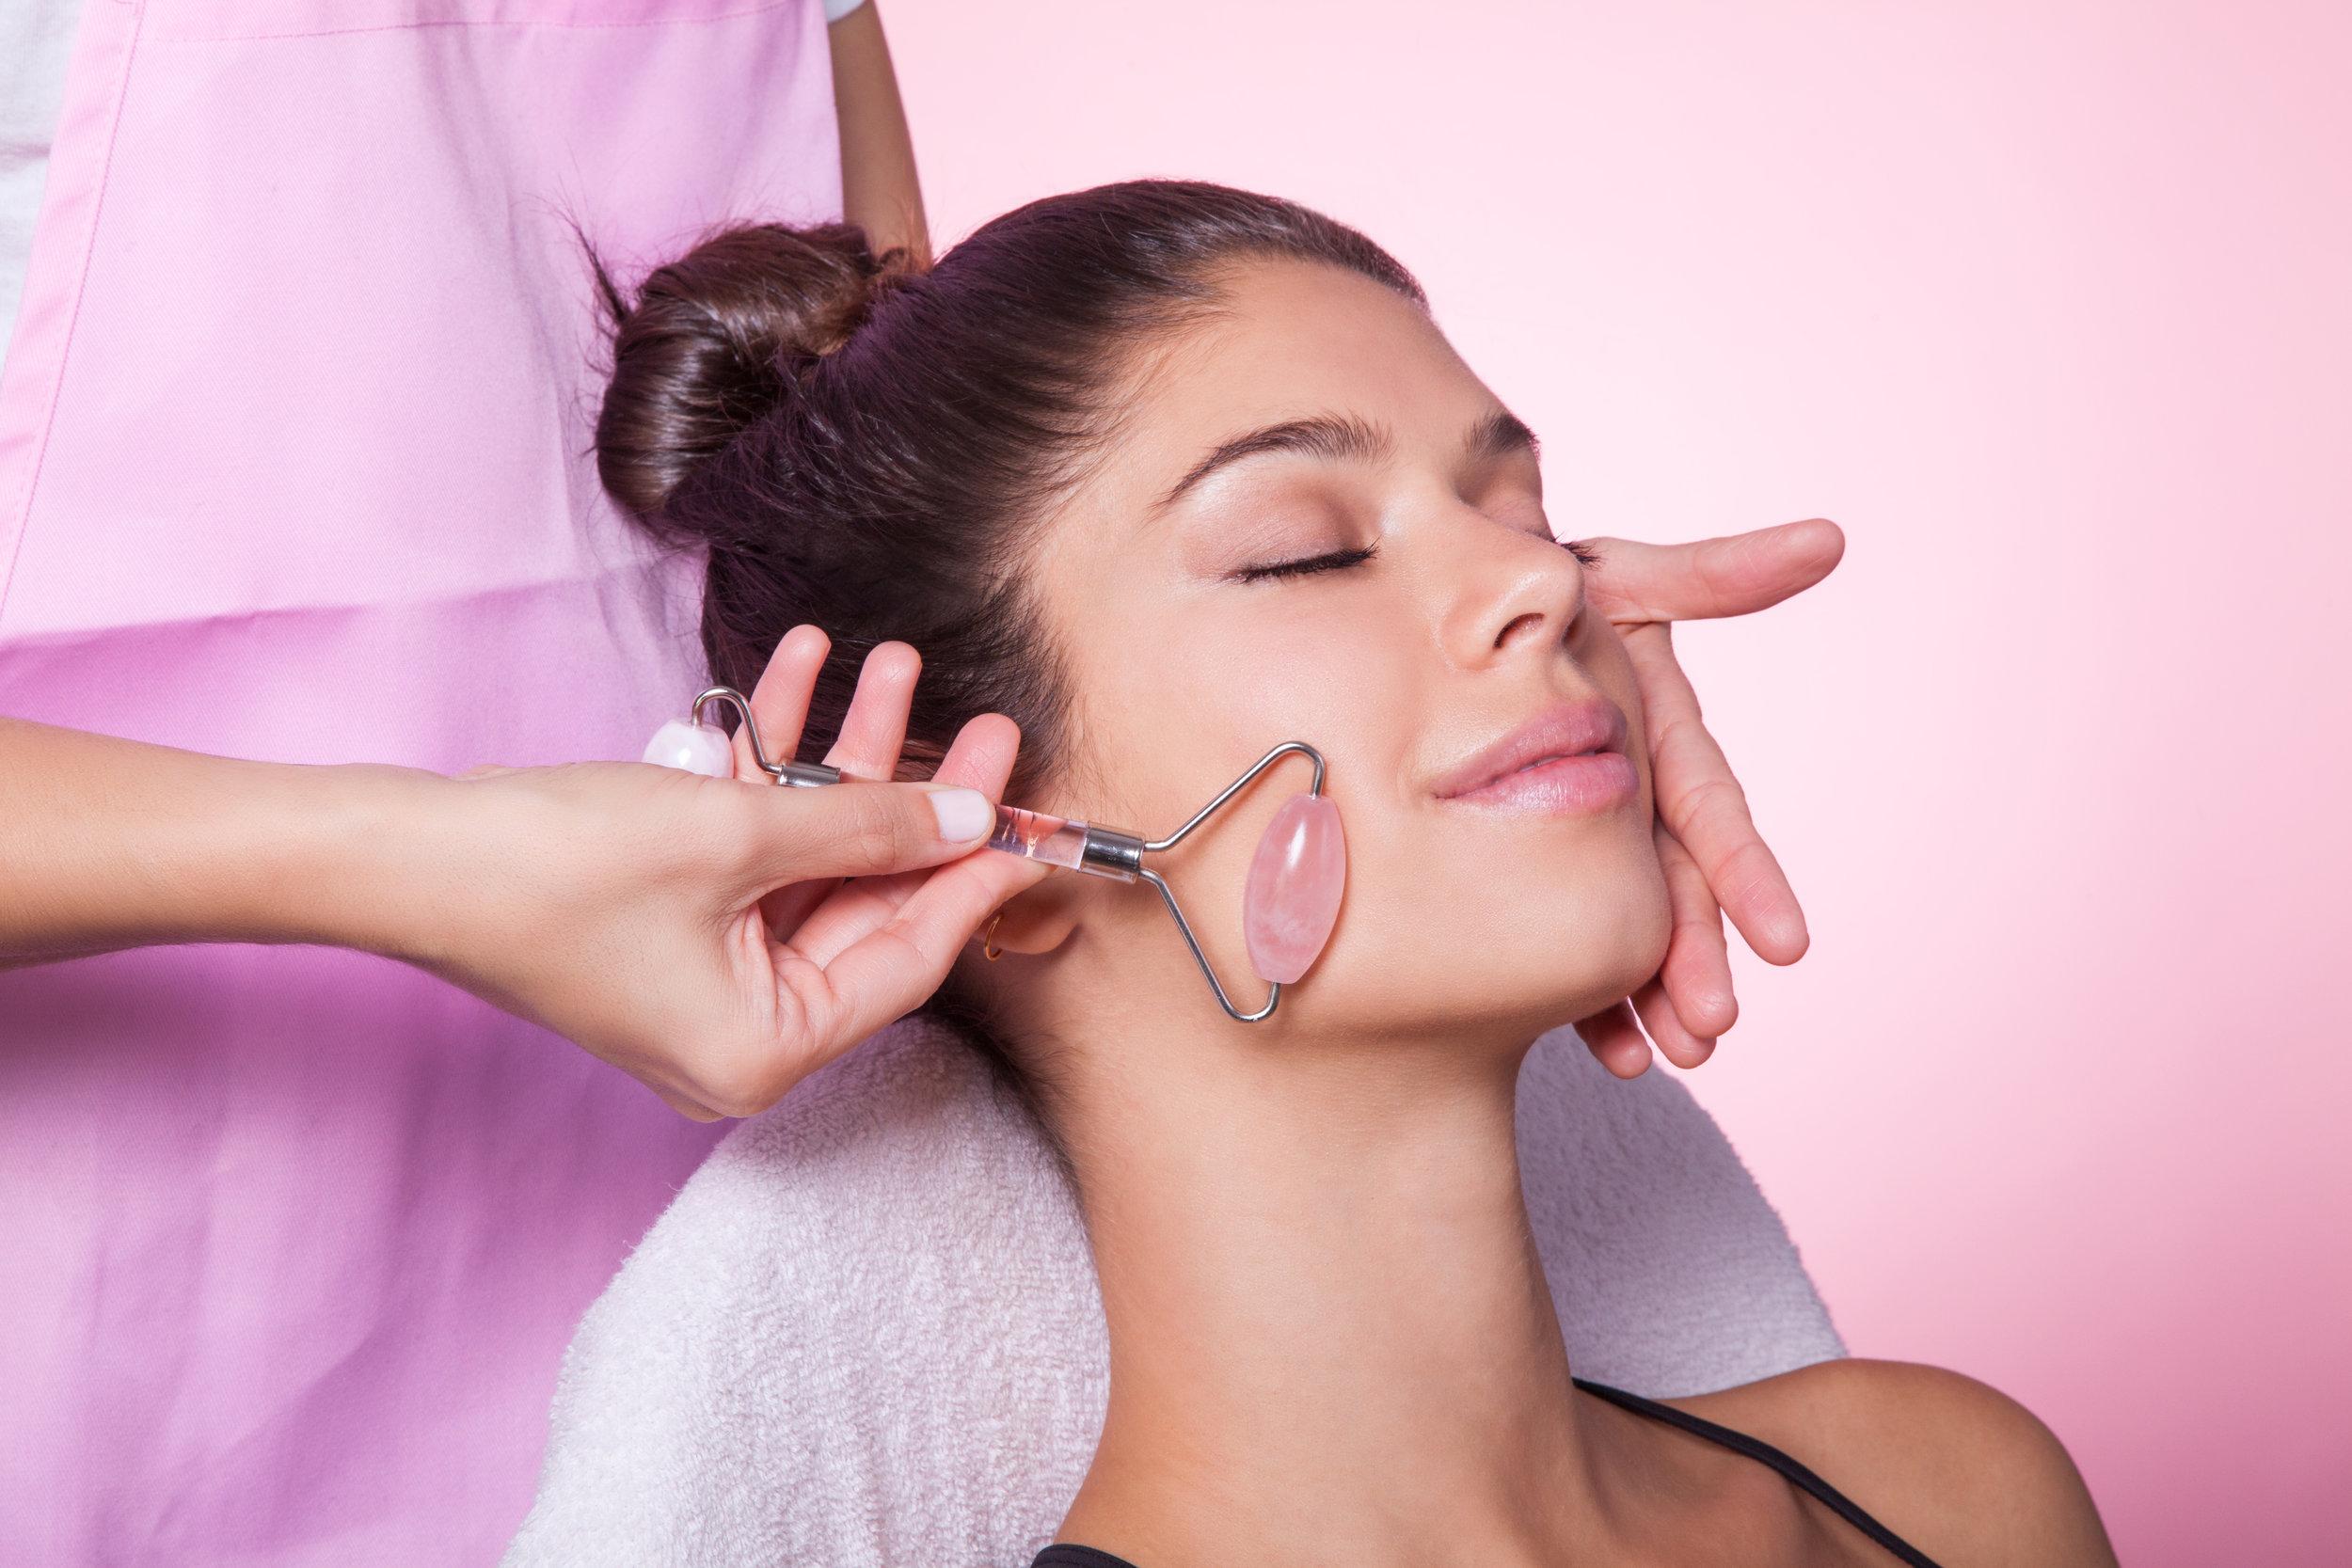 Woman Using Facial Roller